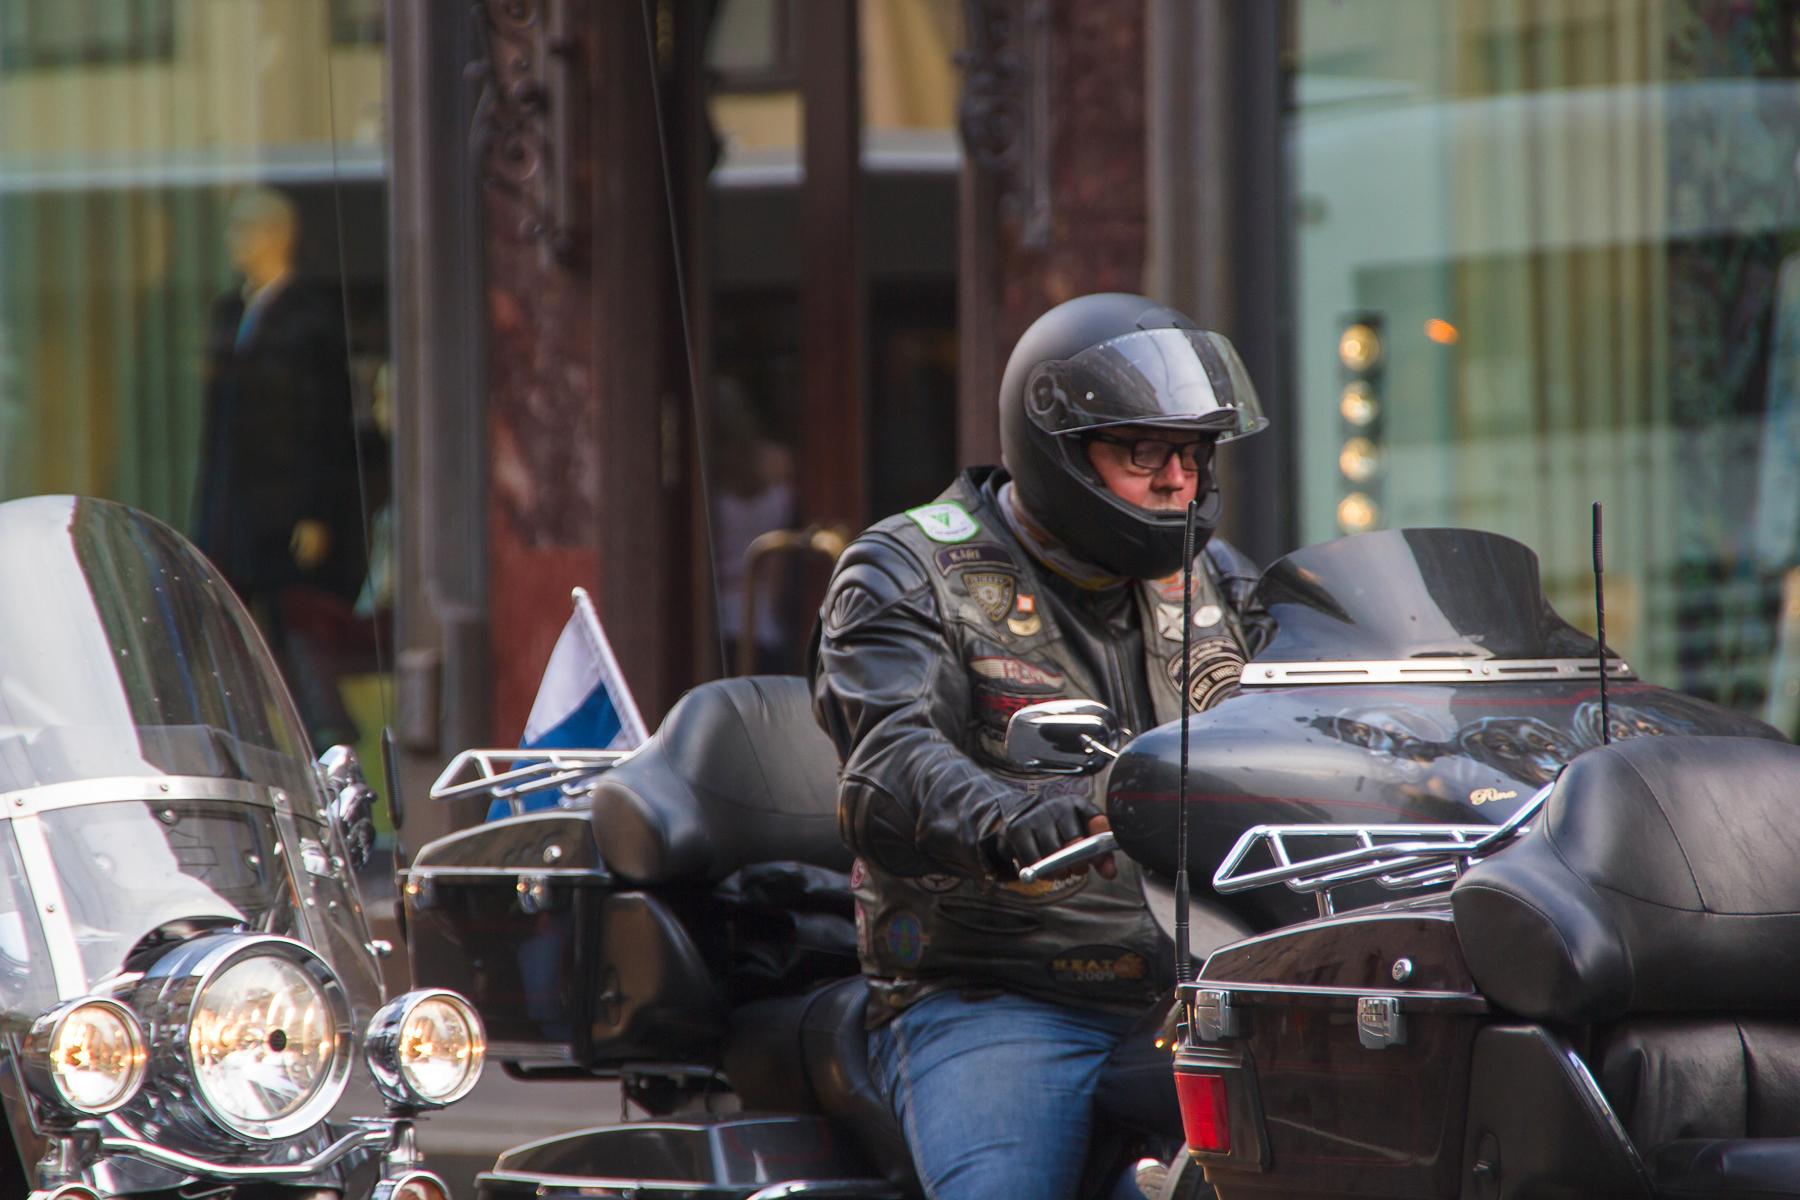 motorcyclist, Adult, Motor, Transportation, Transport, HQ Photo